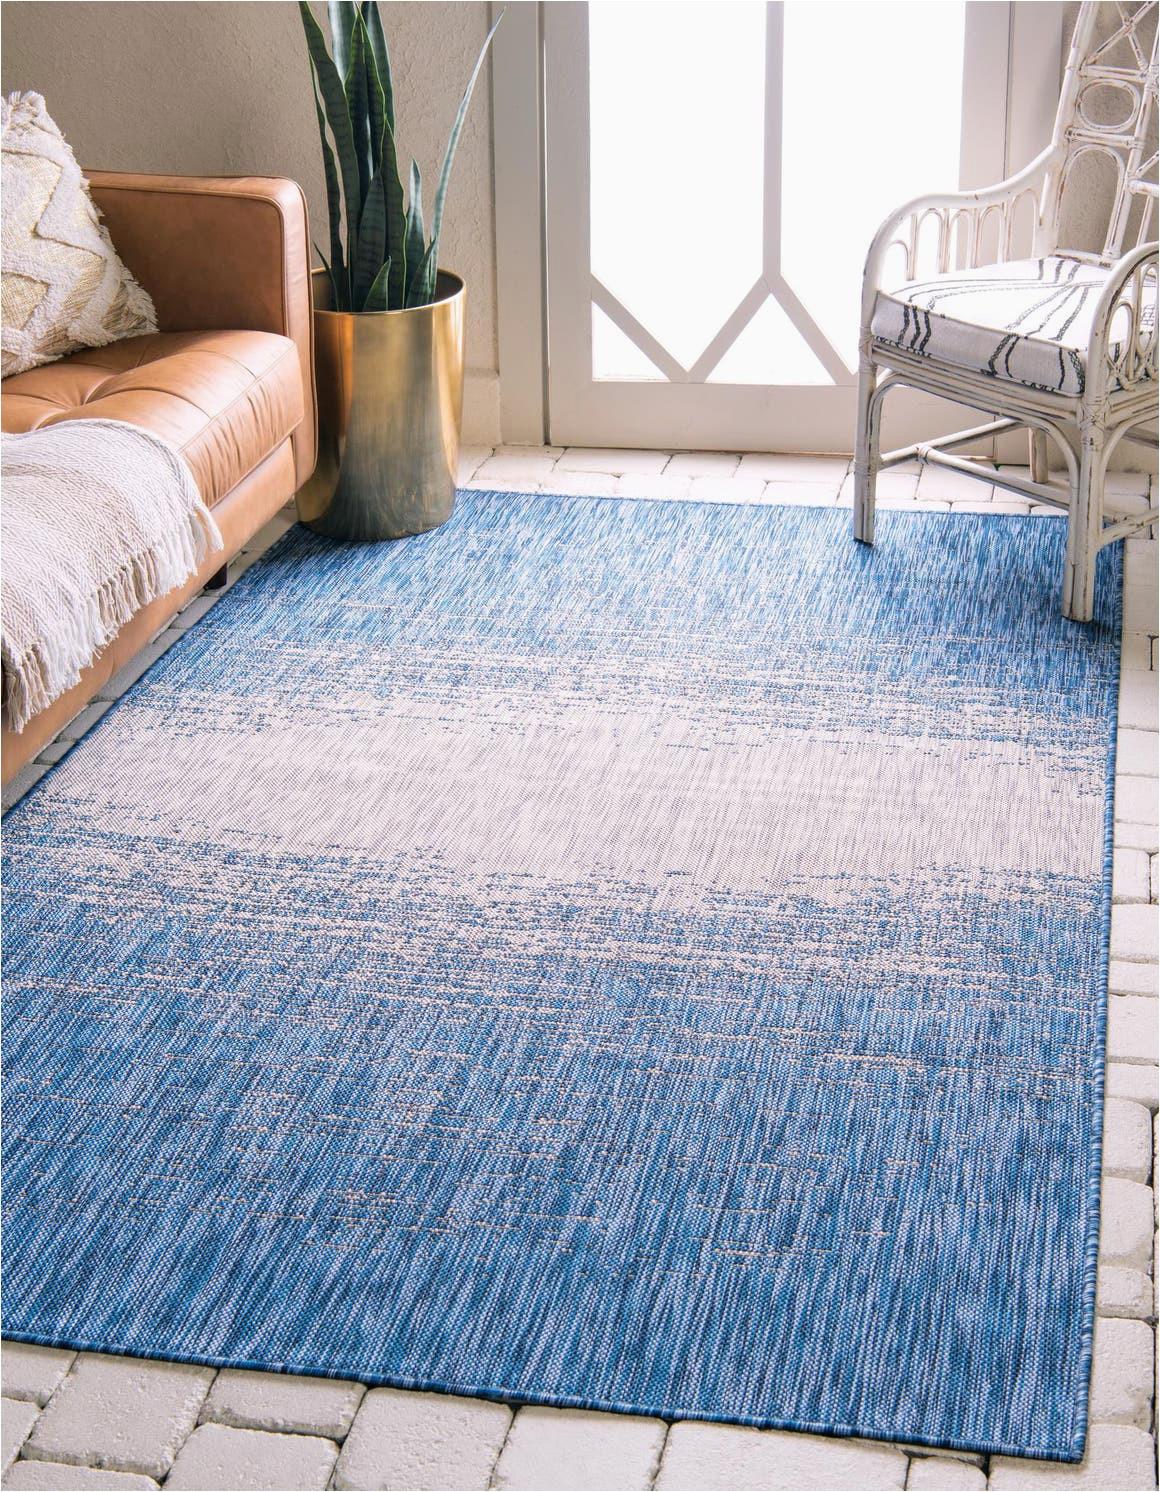 blue 9x12 outdoor modern area rug